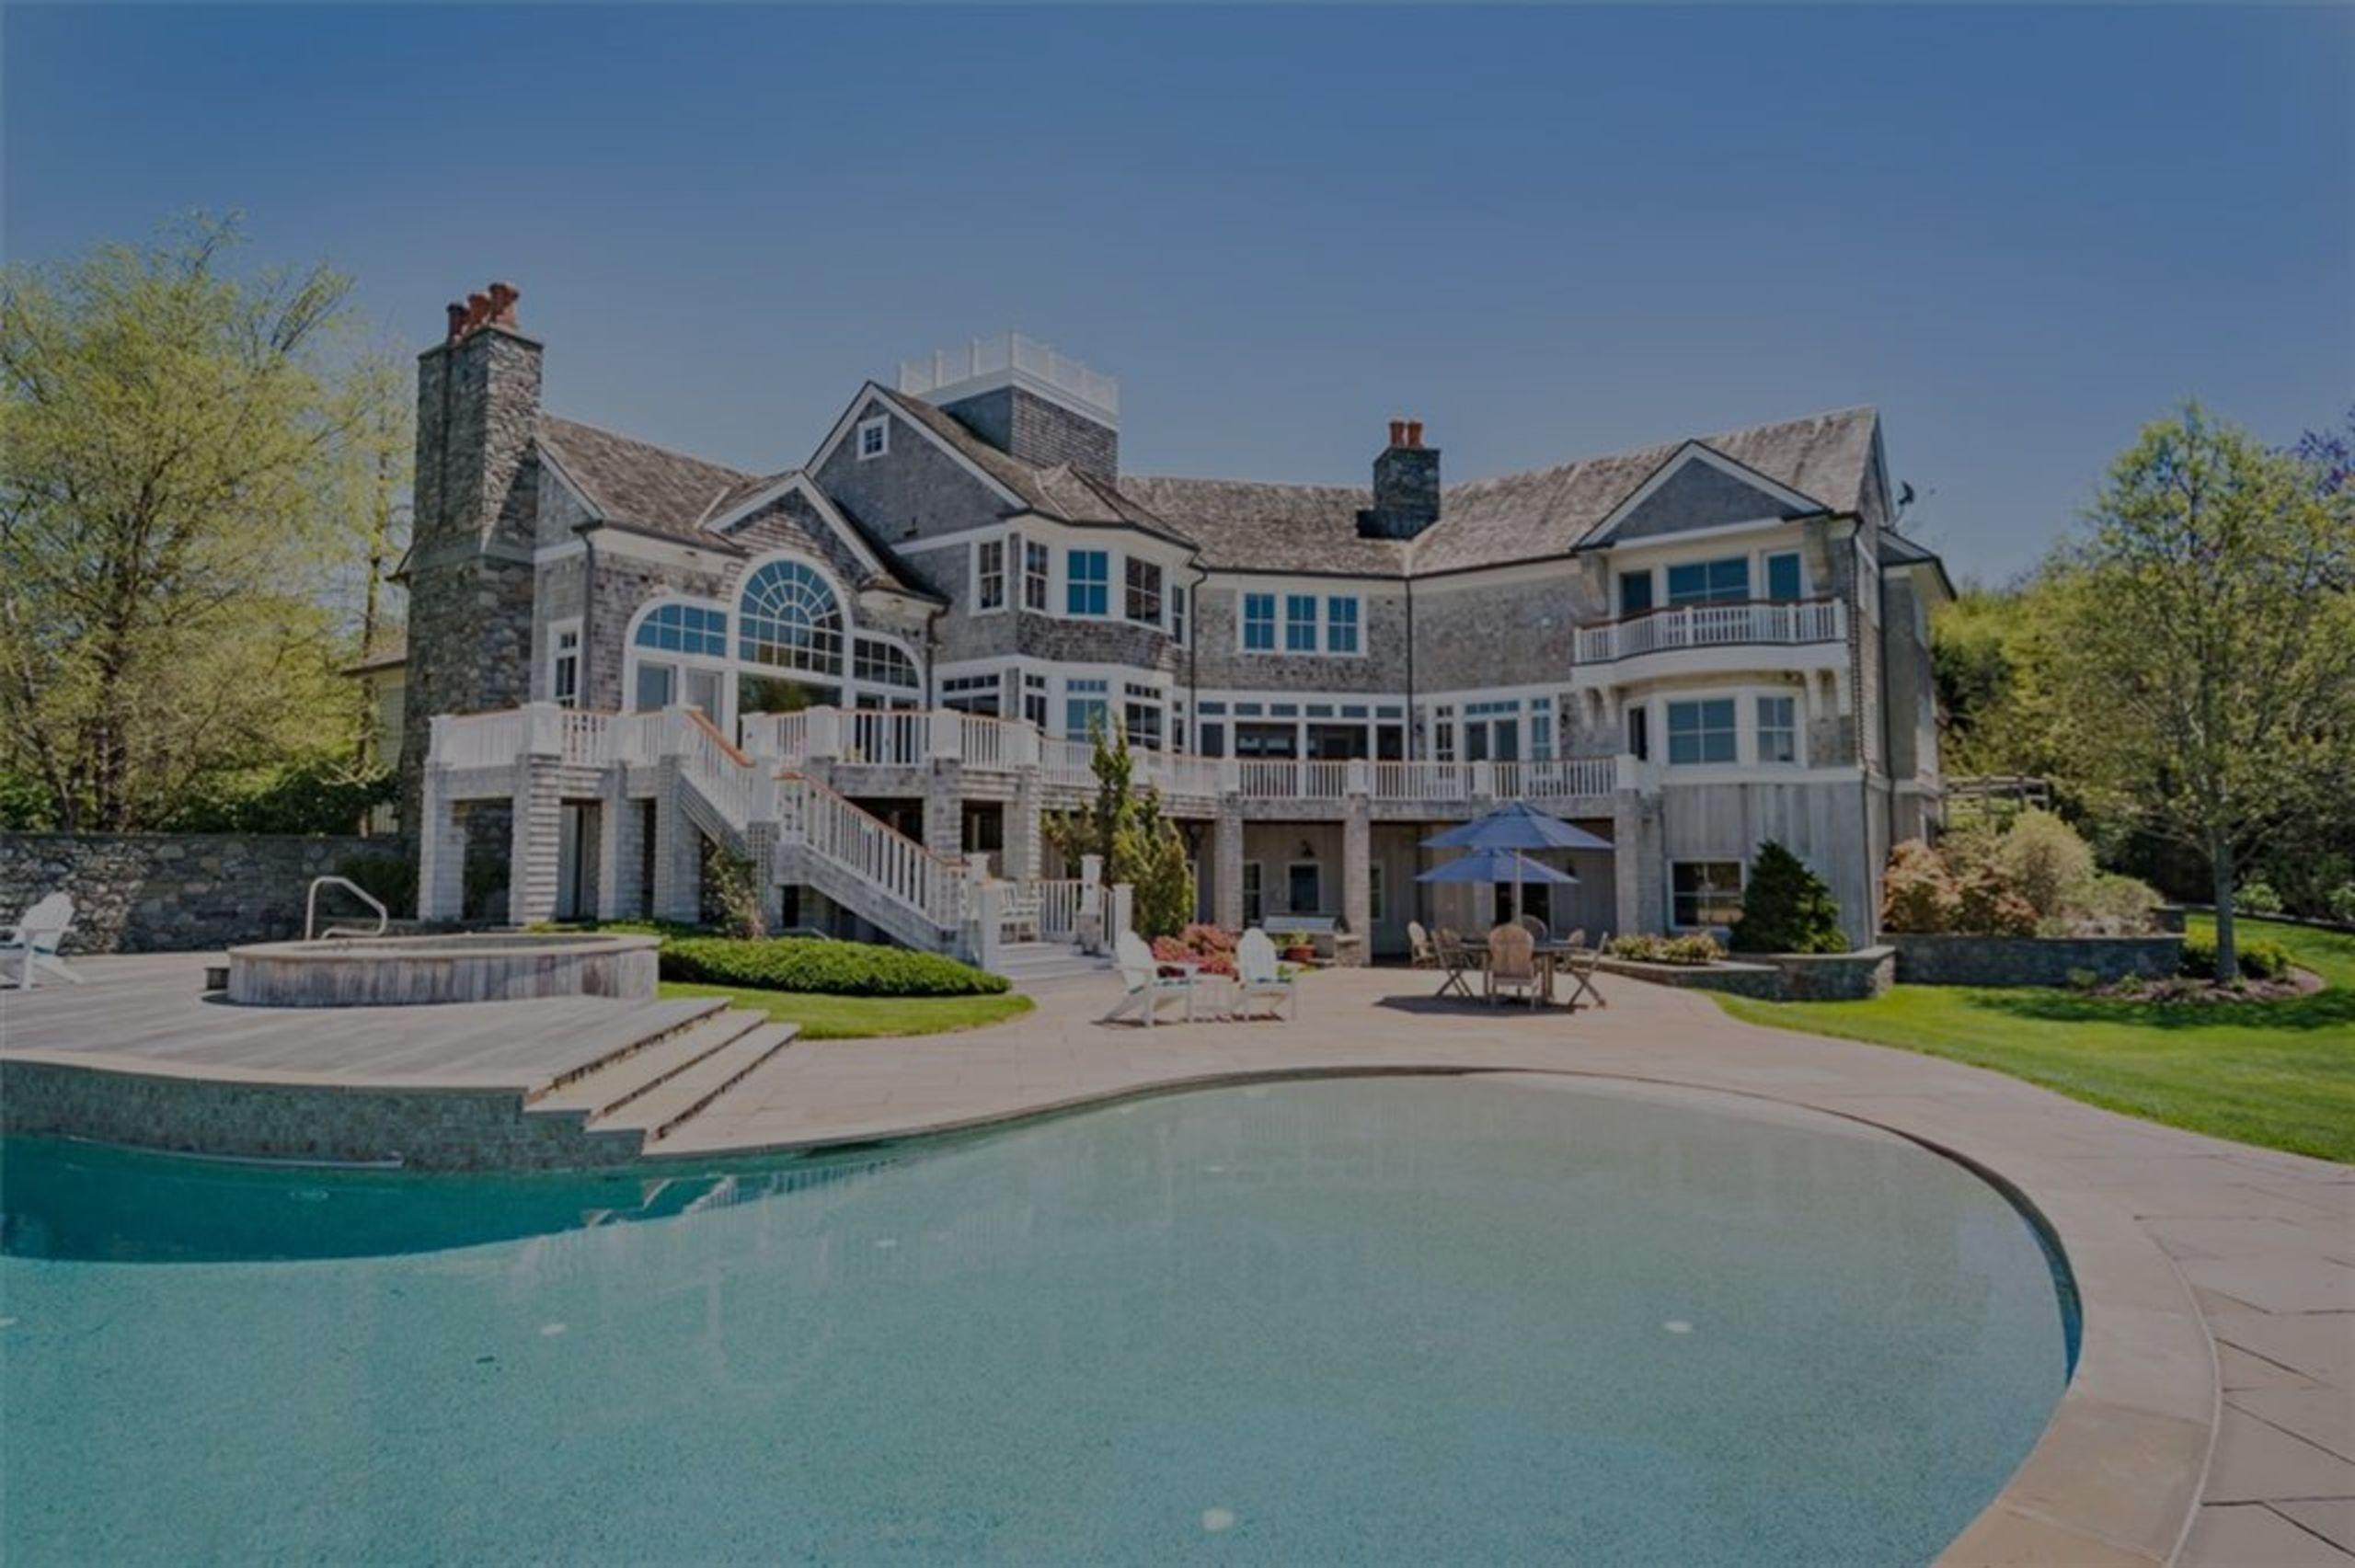 Jamestown, RI Home Sales – April 2019